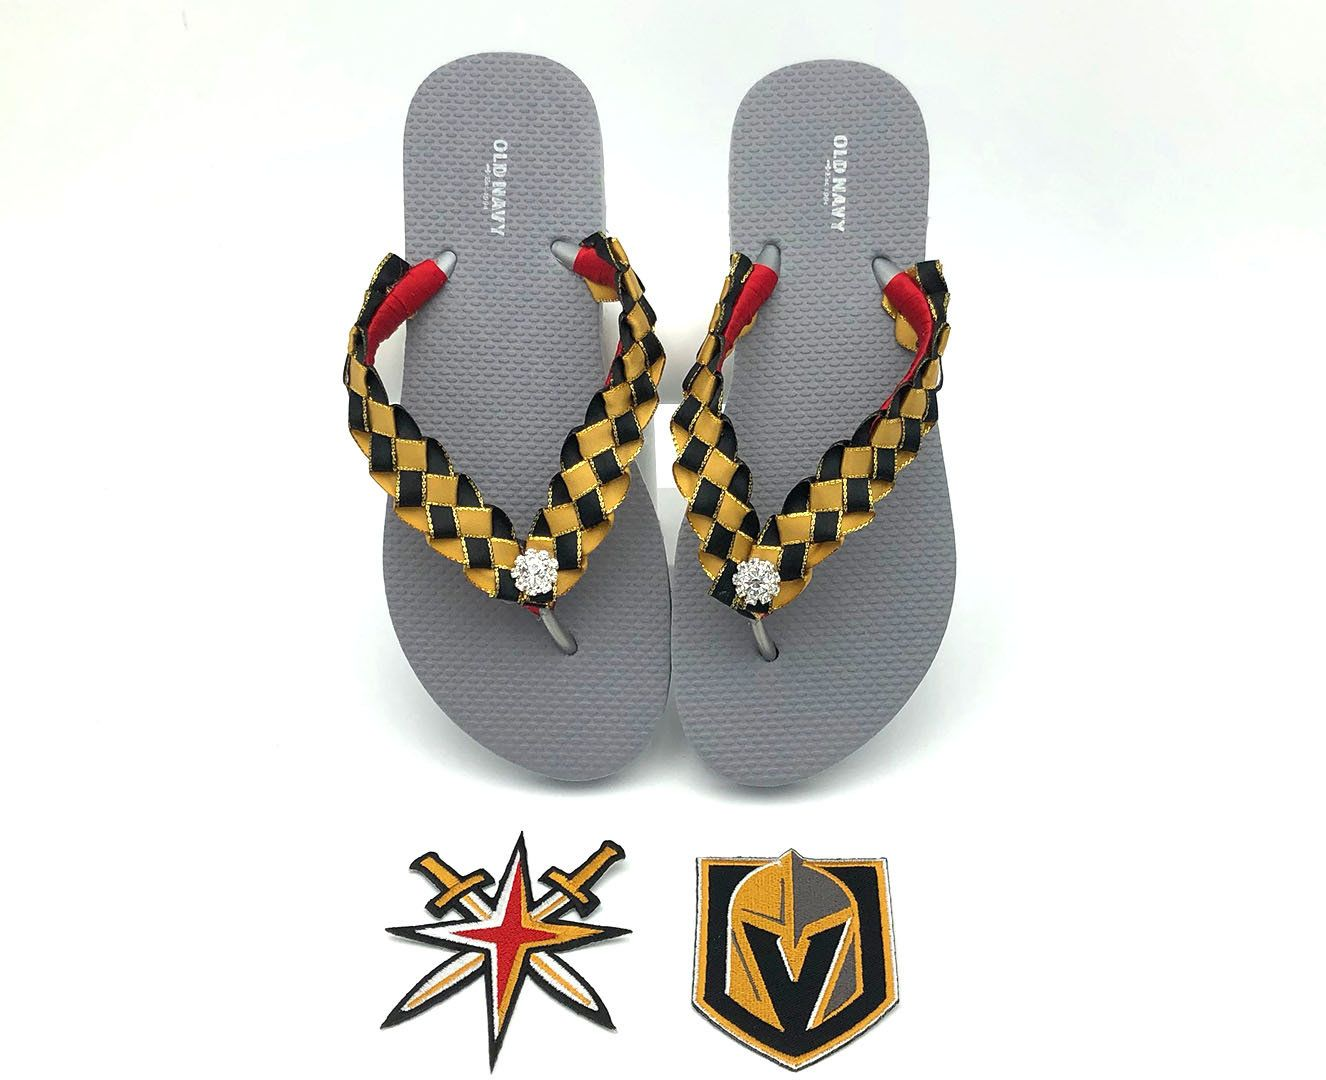 09b0620c5d81 Vegas Golden Knights Hockey inspired Custom Flip Flops - Silver Old Navy  Flip Flops by CrystalsByLola on Etsy